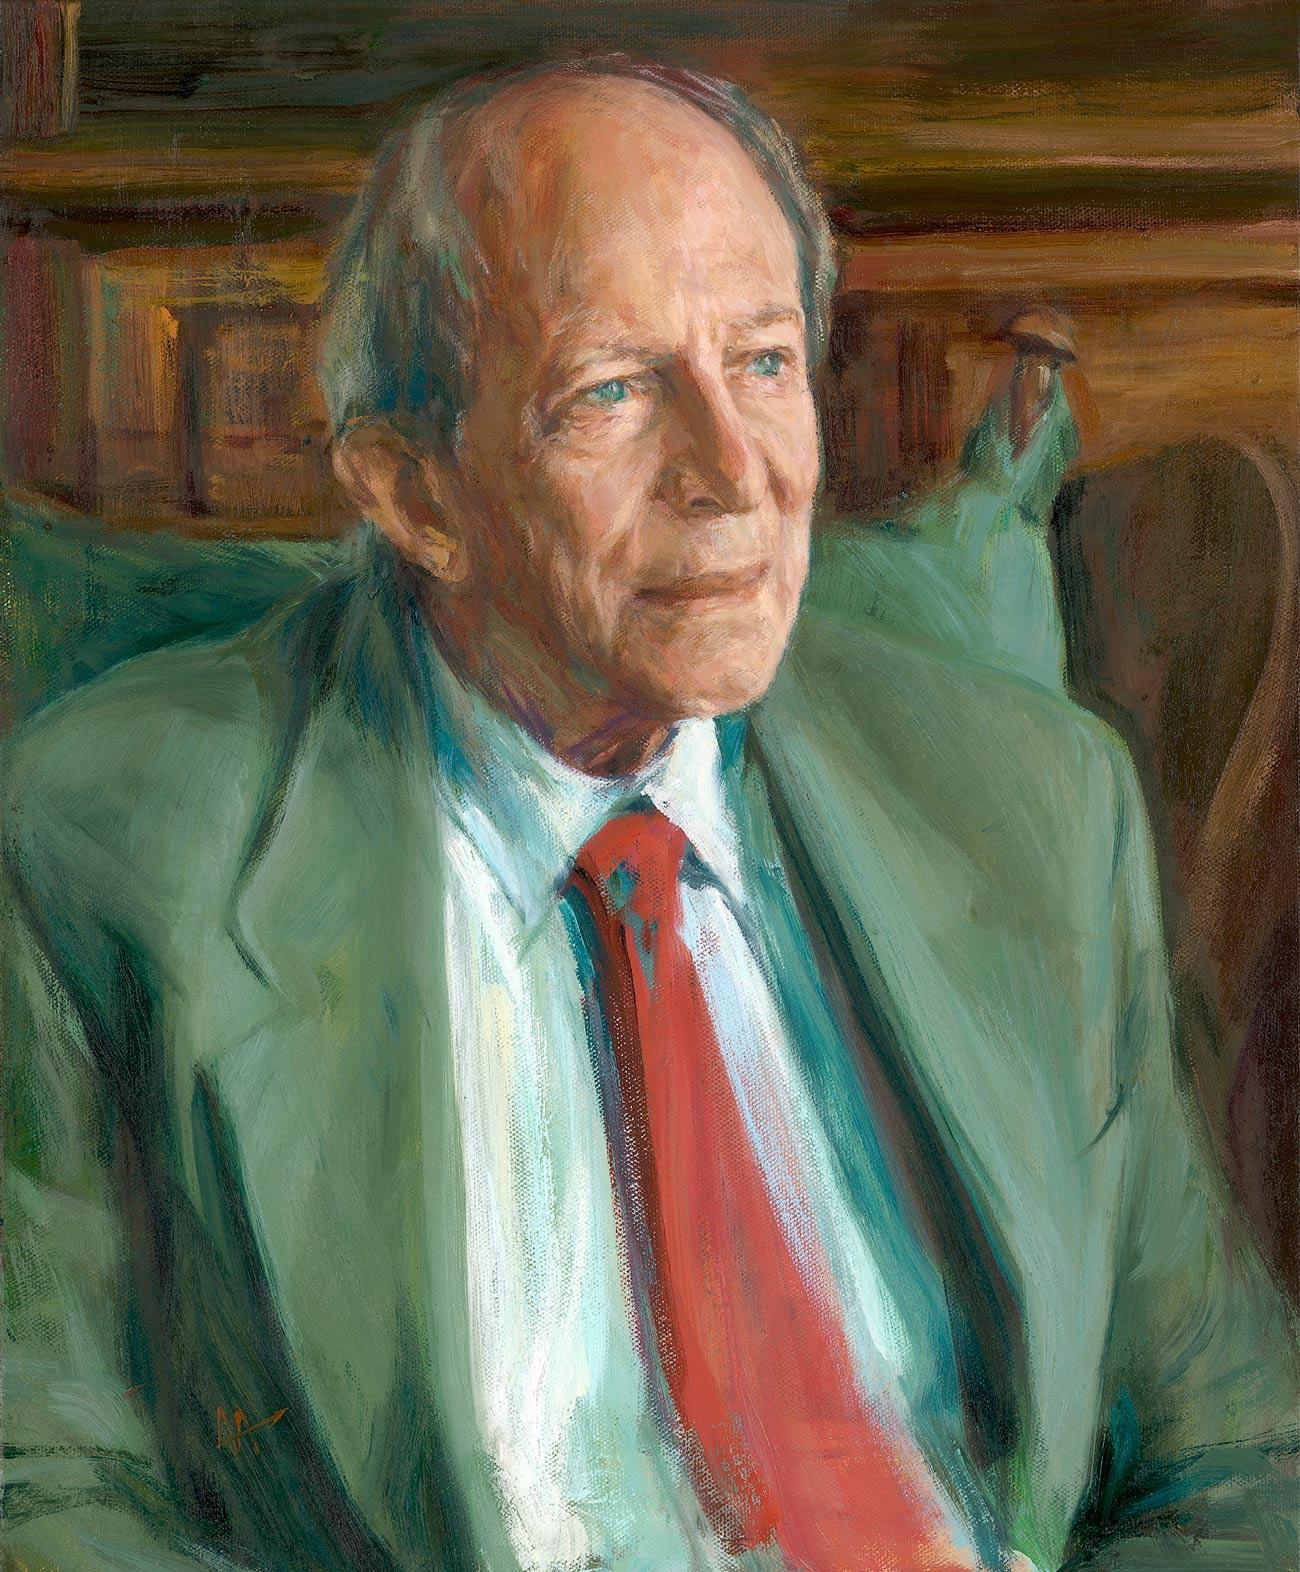 Portrait of Peter Allen. Commission portrait by British artist Marina Kim